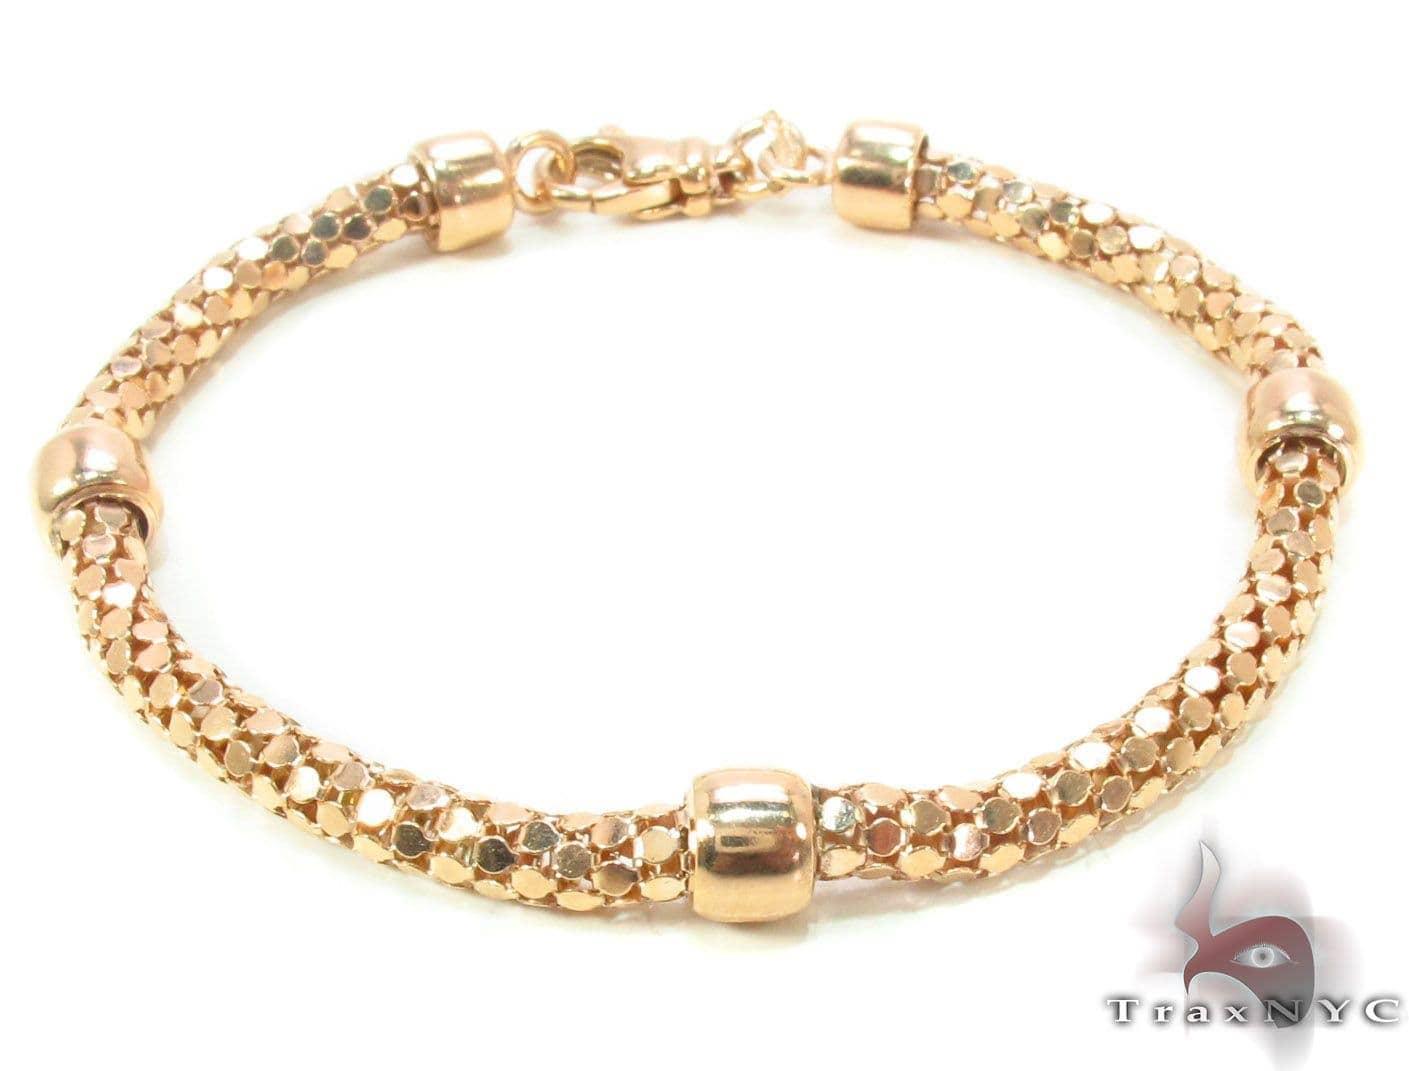 Silver Bracelet 34472 Silver & Stainless Steel